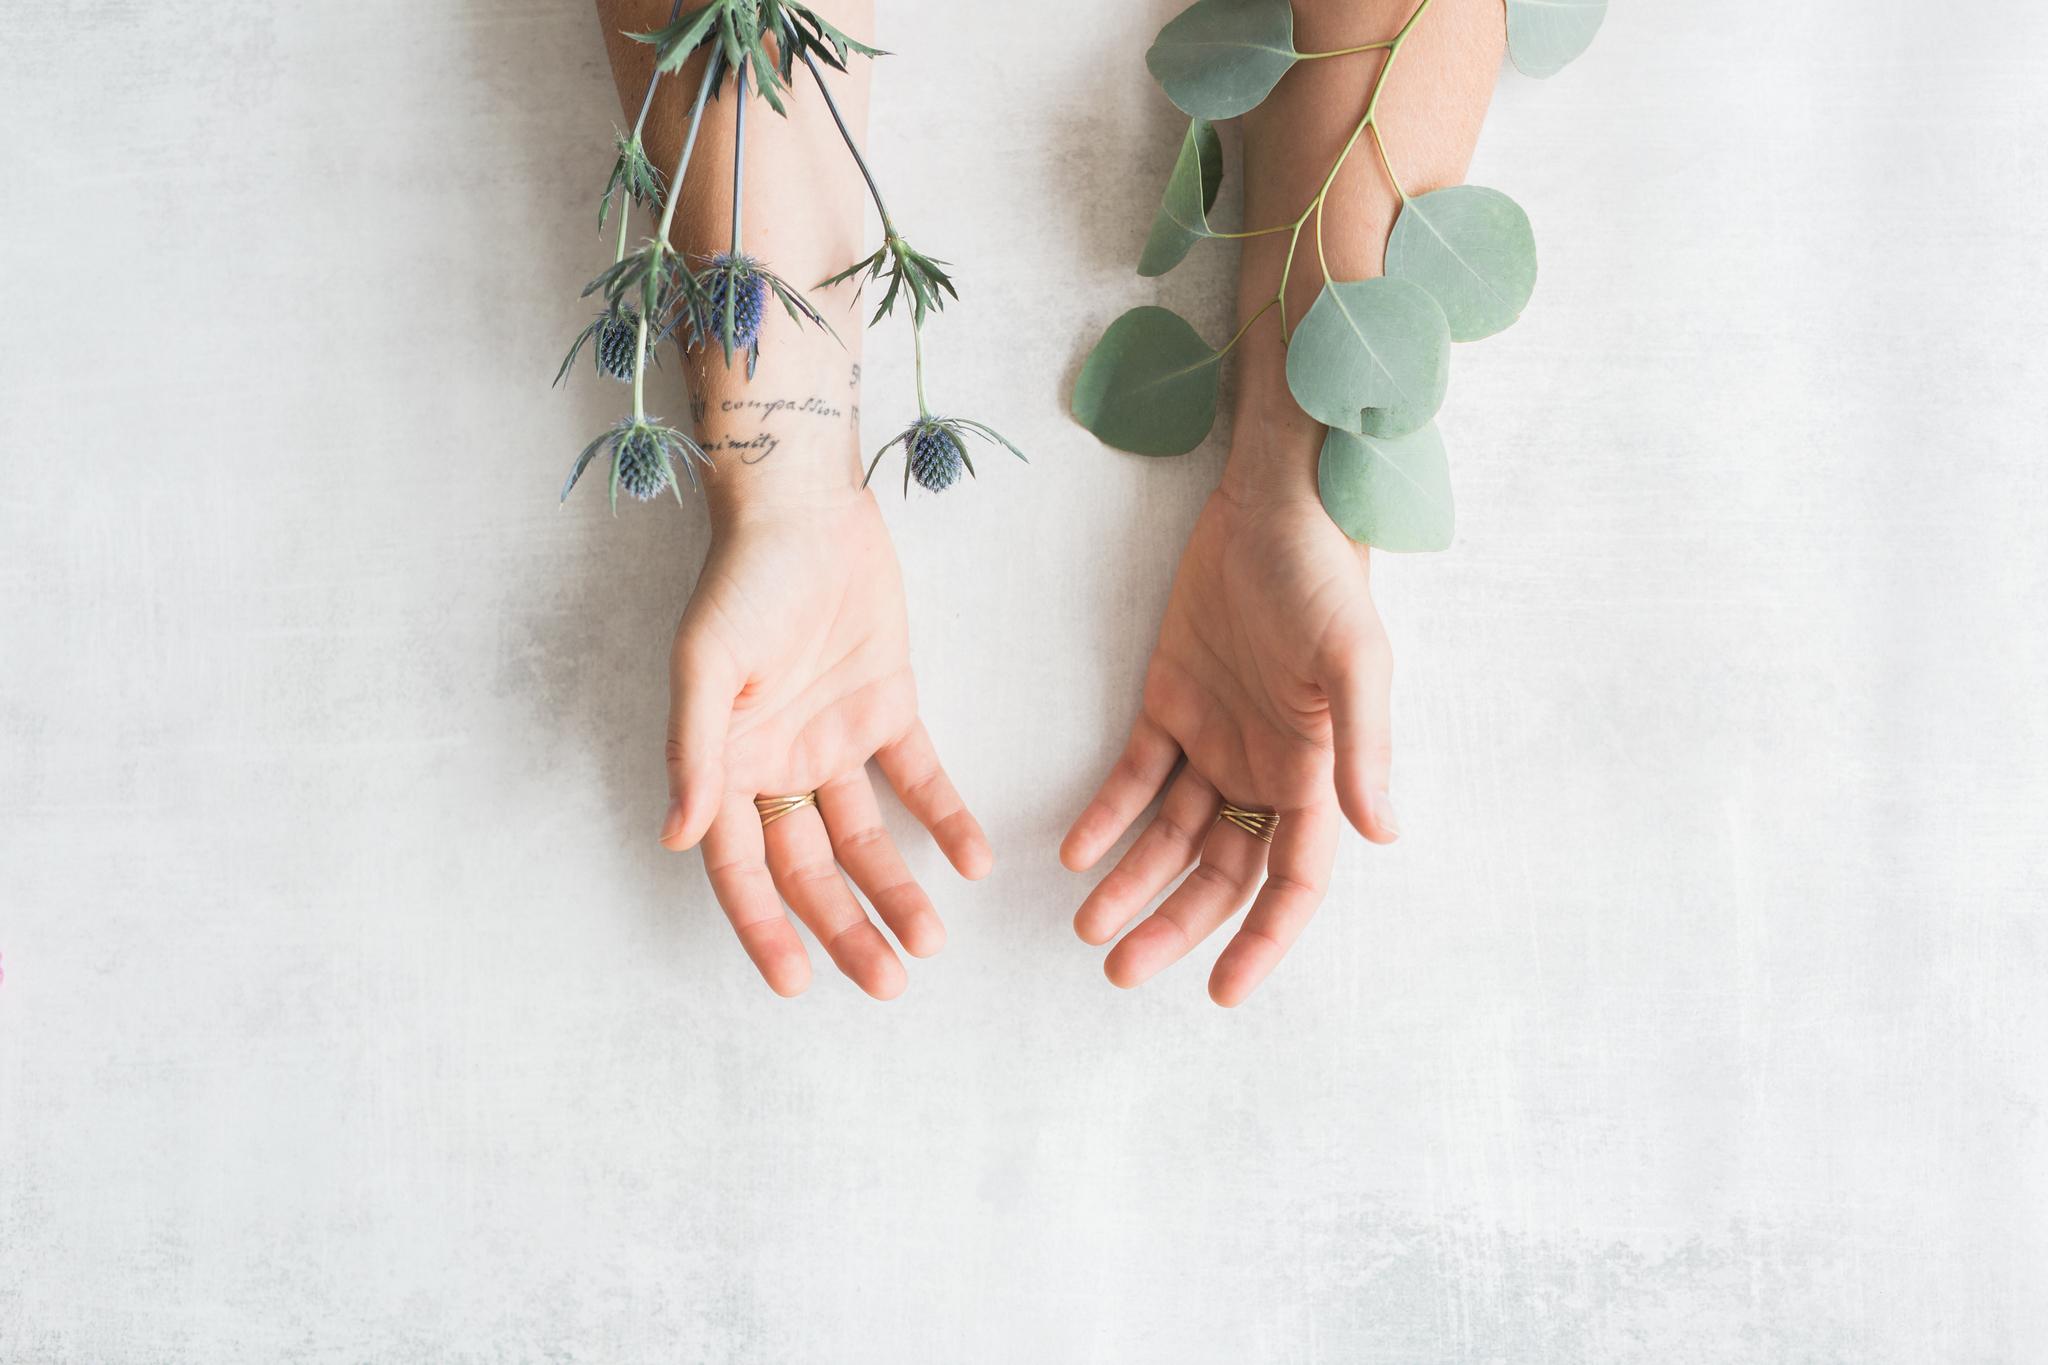 botanical hands.jpg